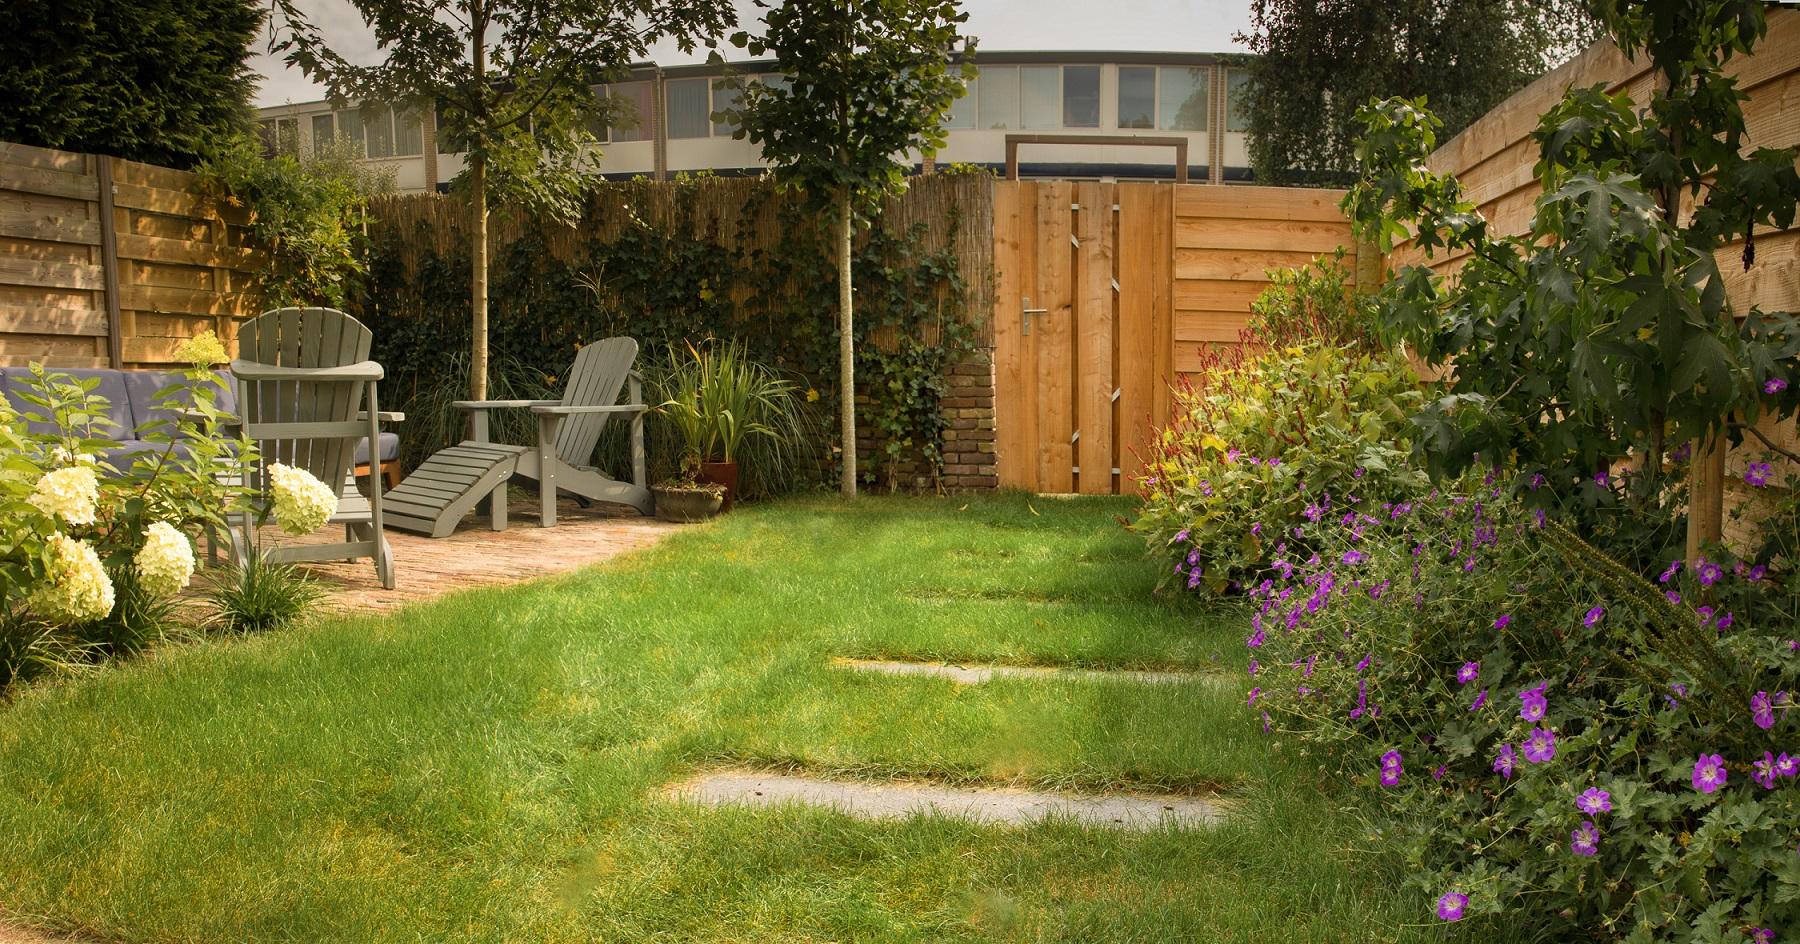 Verdi tuinen tuinontwerp tuinaanleg en tuinonderhoud 🌳